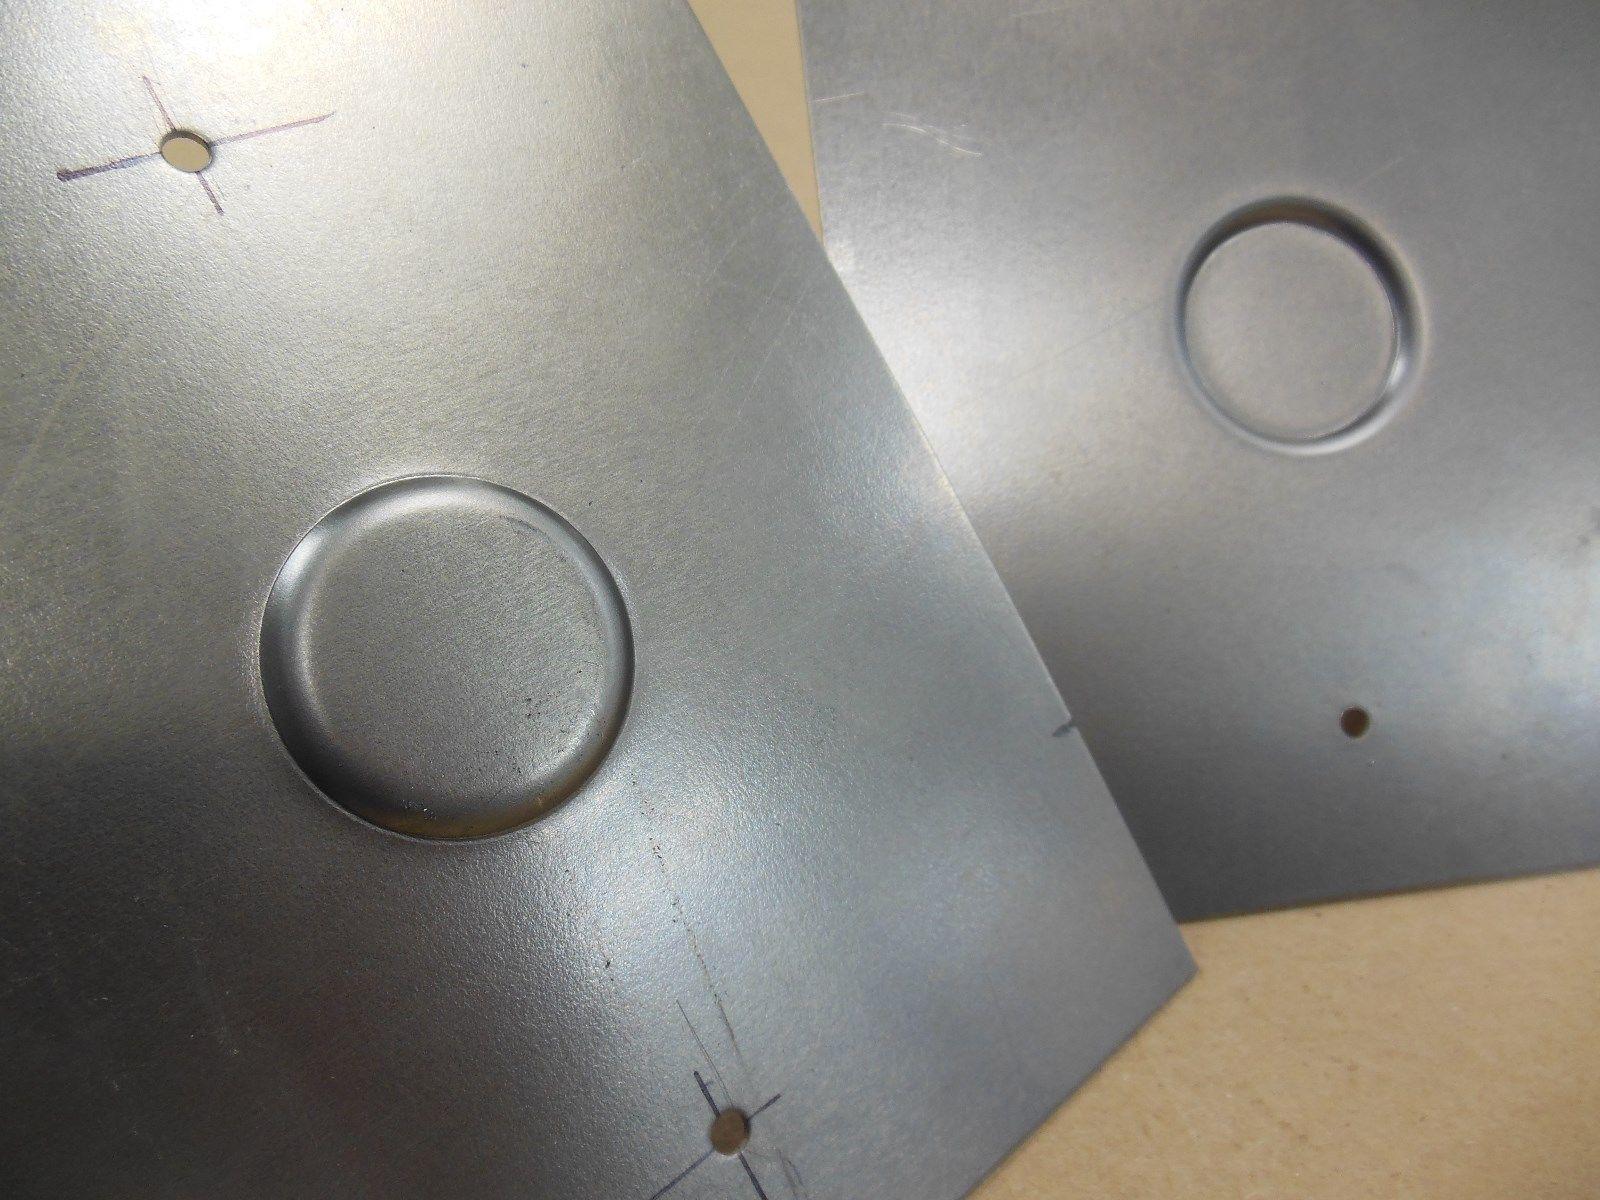 18 Gauge Stamped Recessed Key Lock Panels for 1967-1969 Camaro Door